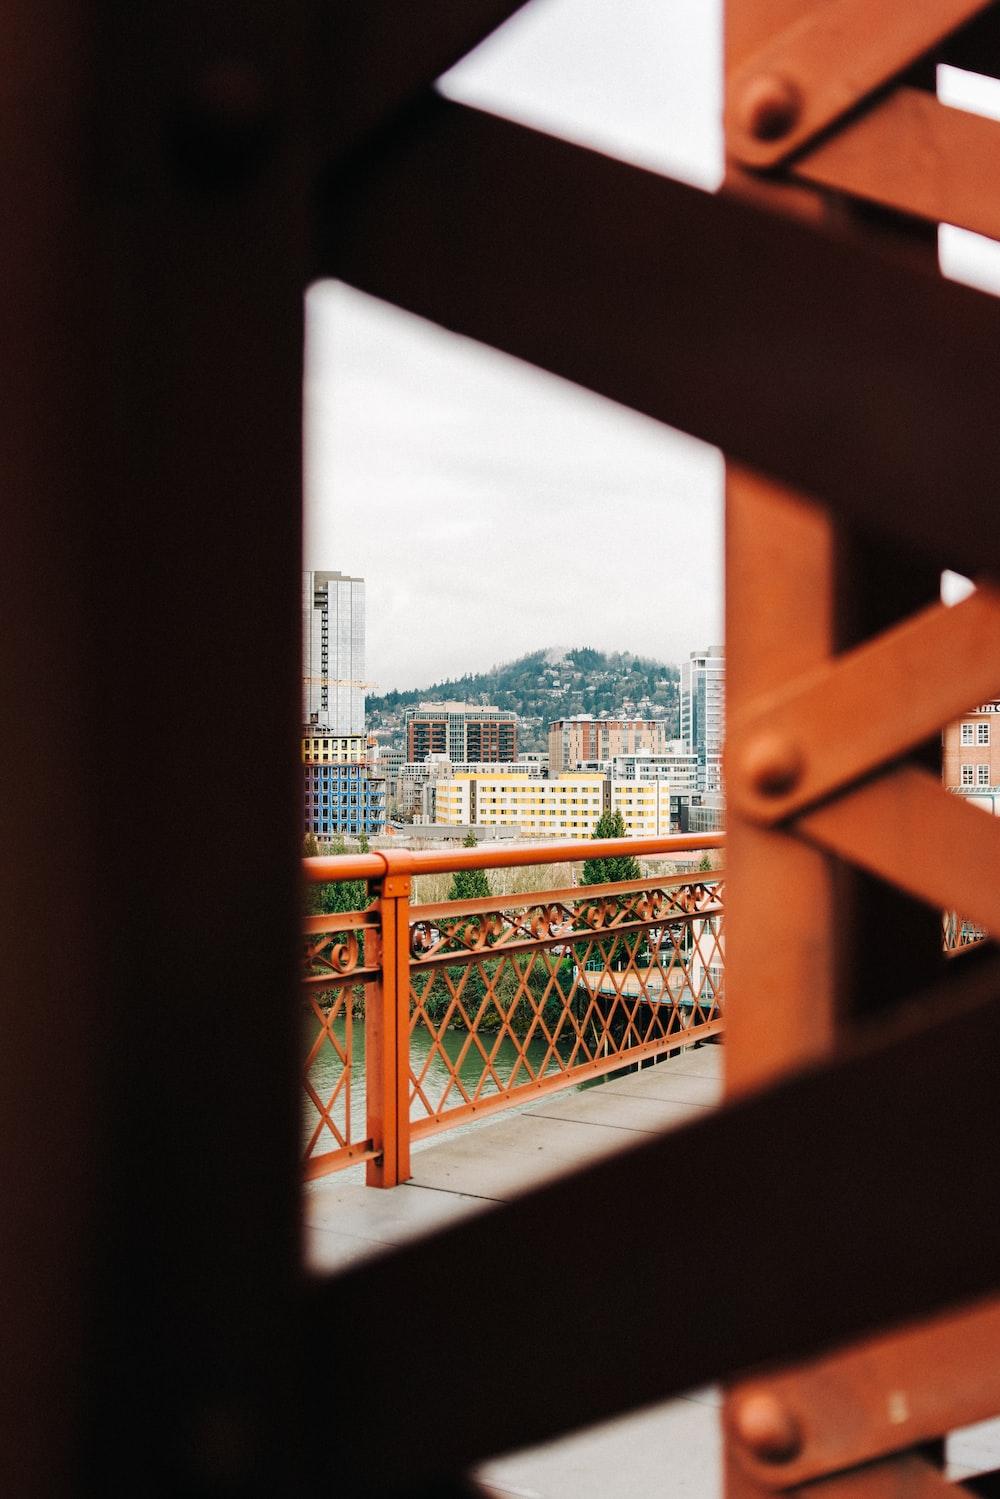 tilt-shift photography of handrails